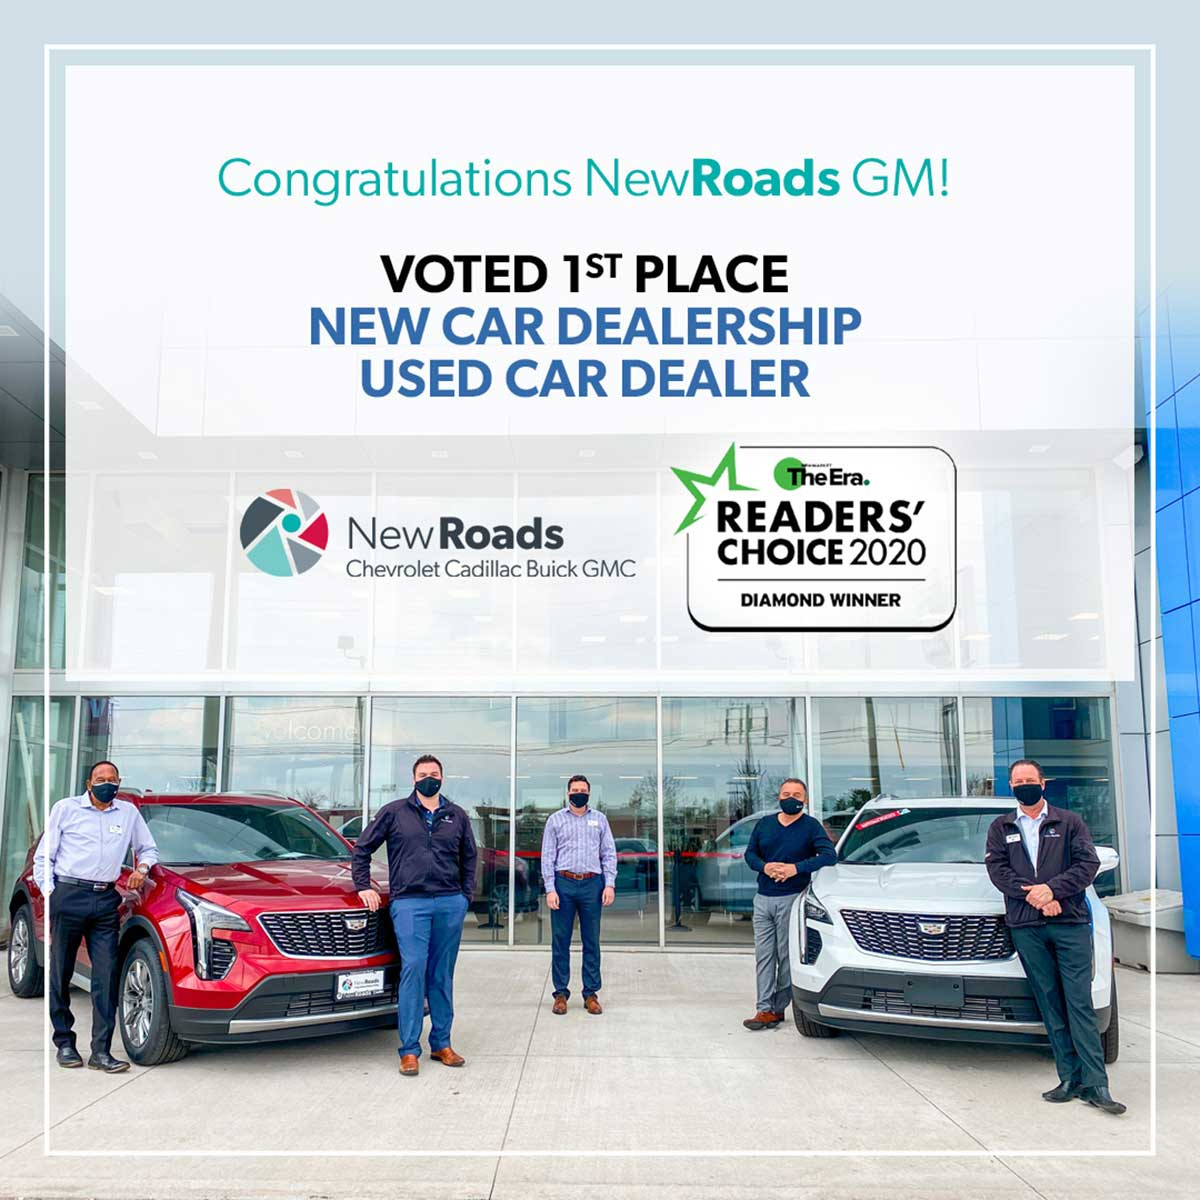 Readers' Choice Best Car Dealership